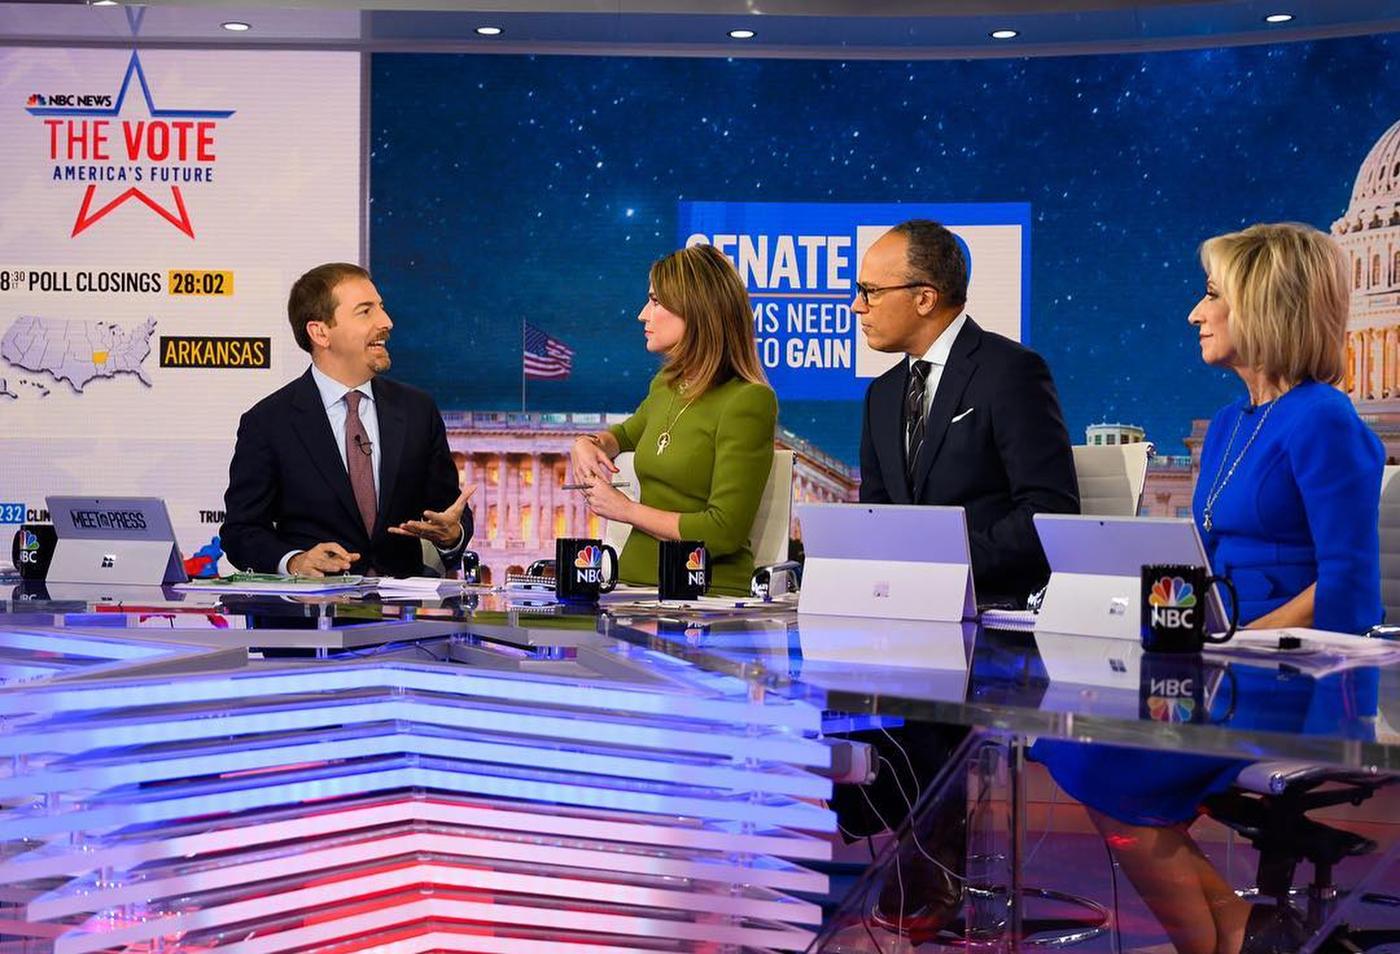 NCS_MSNBC-NBC-News-Election-Studio_0006